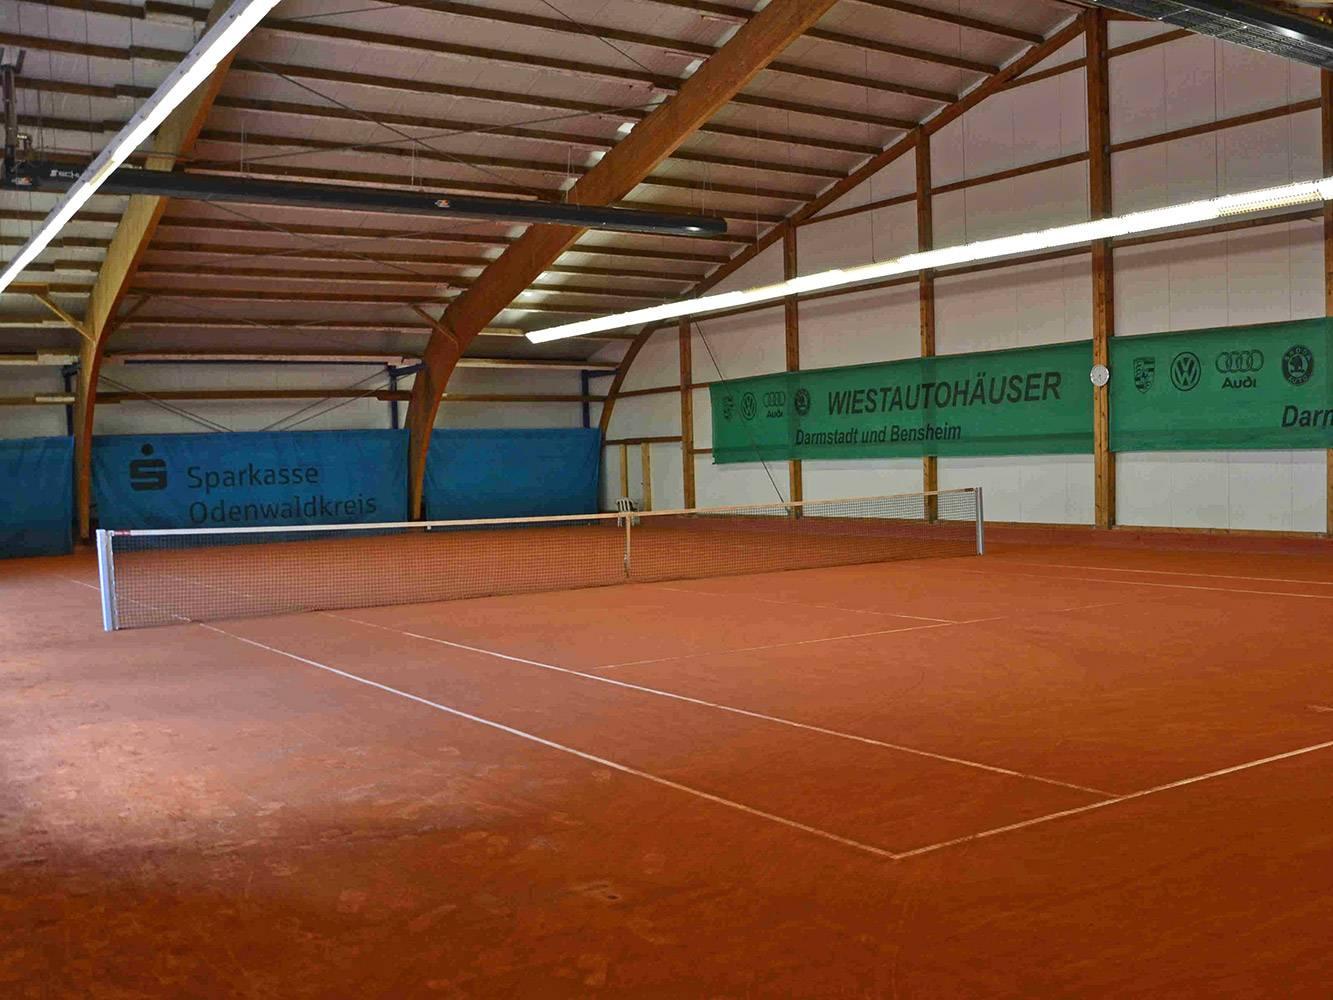 tennisclub darmstadt restaurant. Black Bedroom Furniture Sets. Home Design Ideas